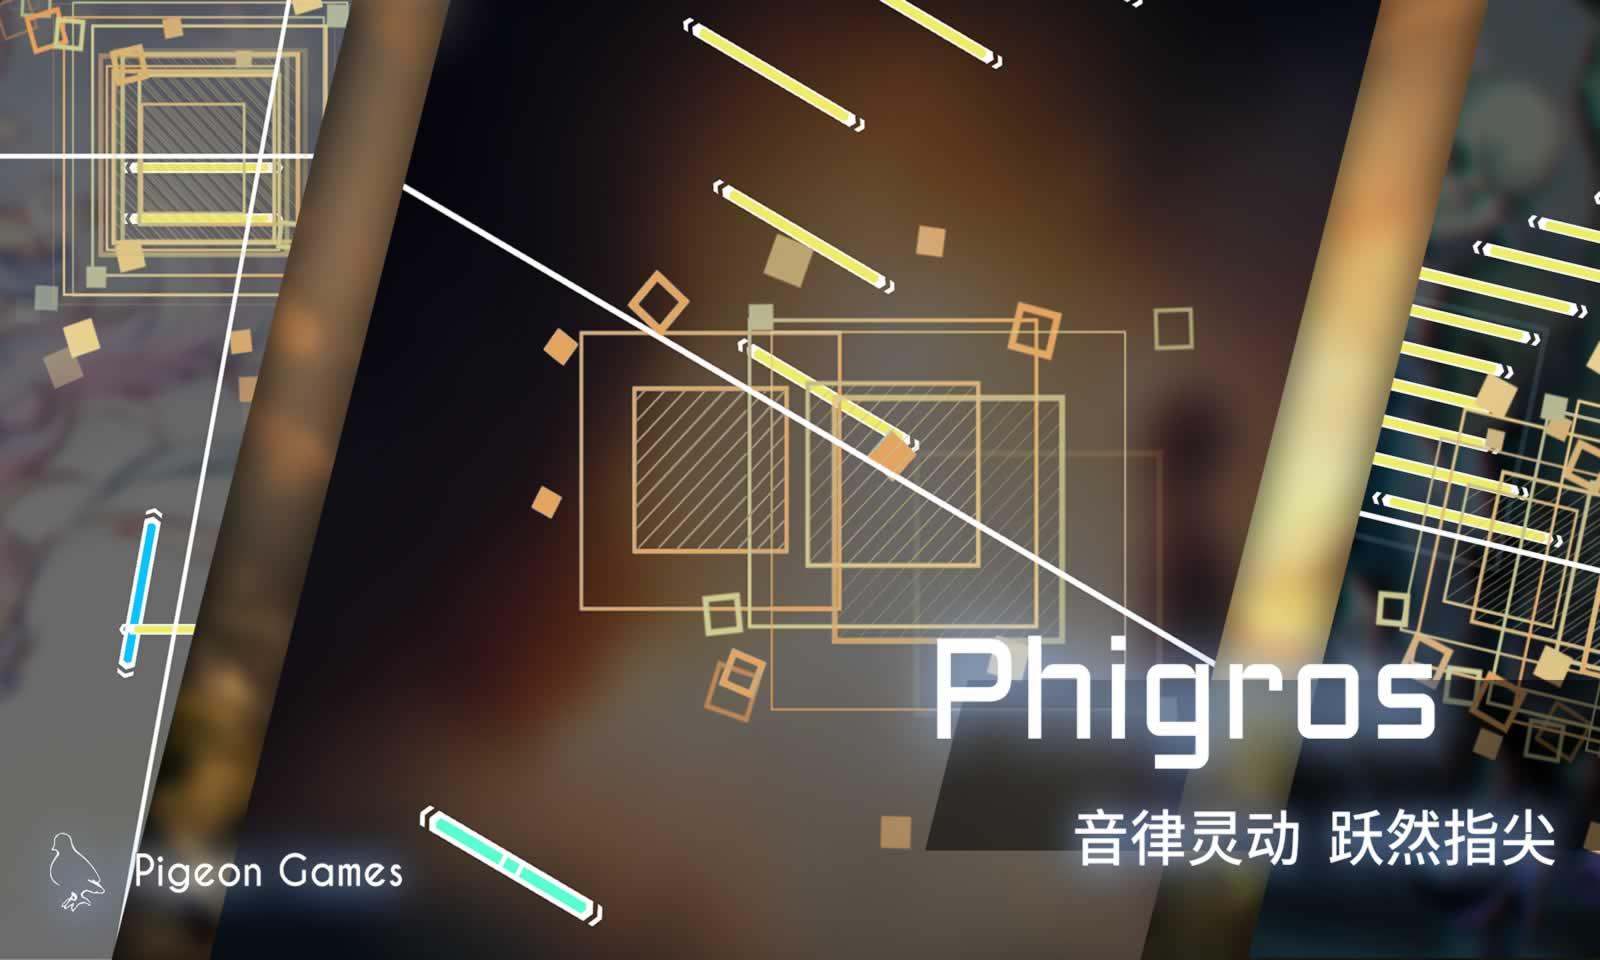 Phigros